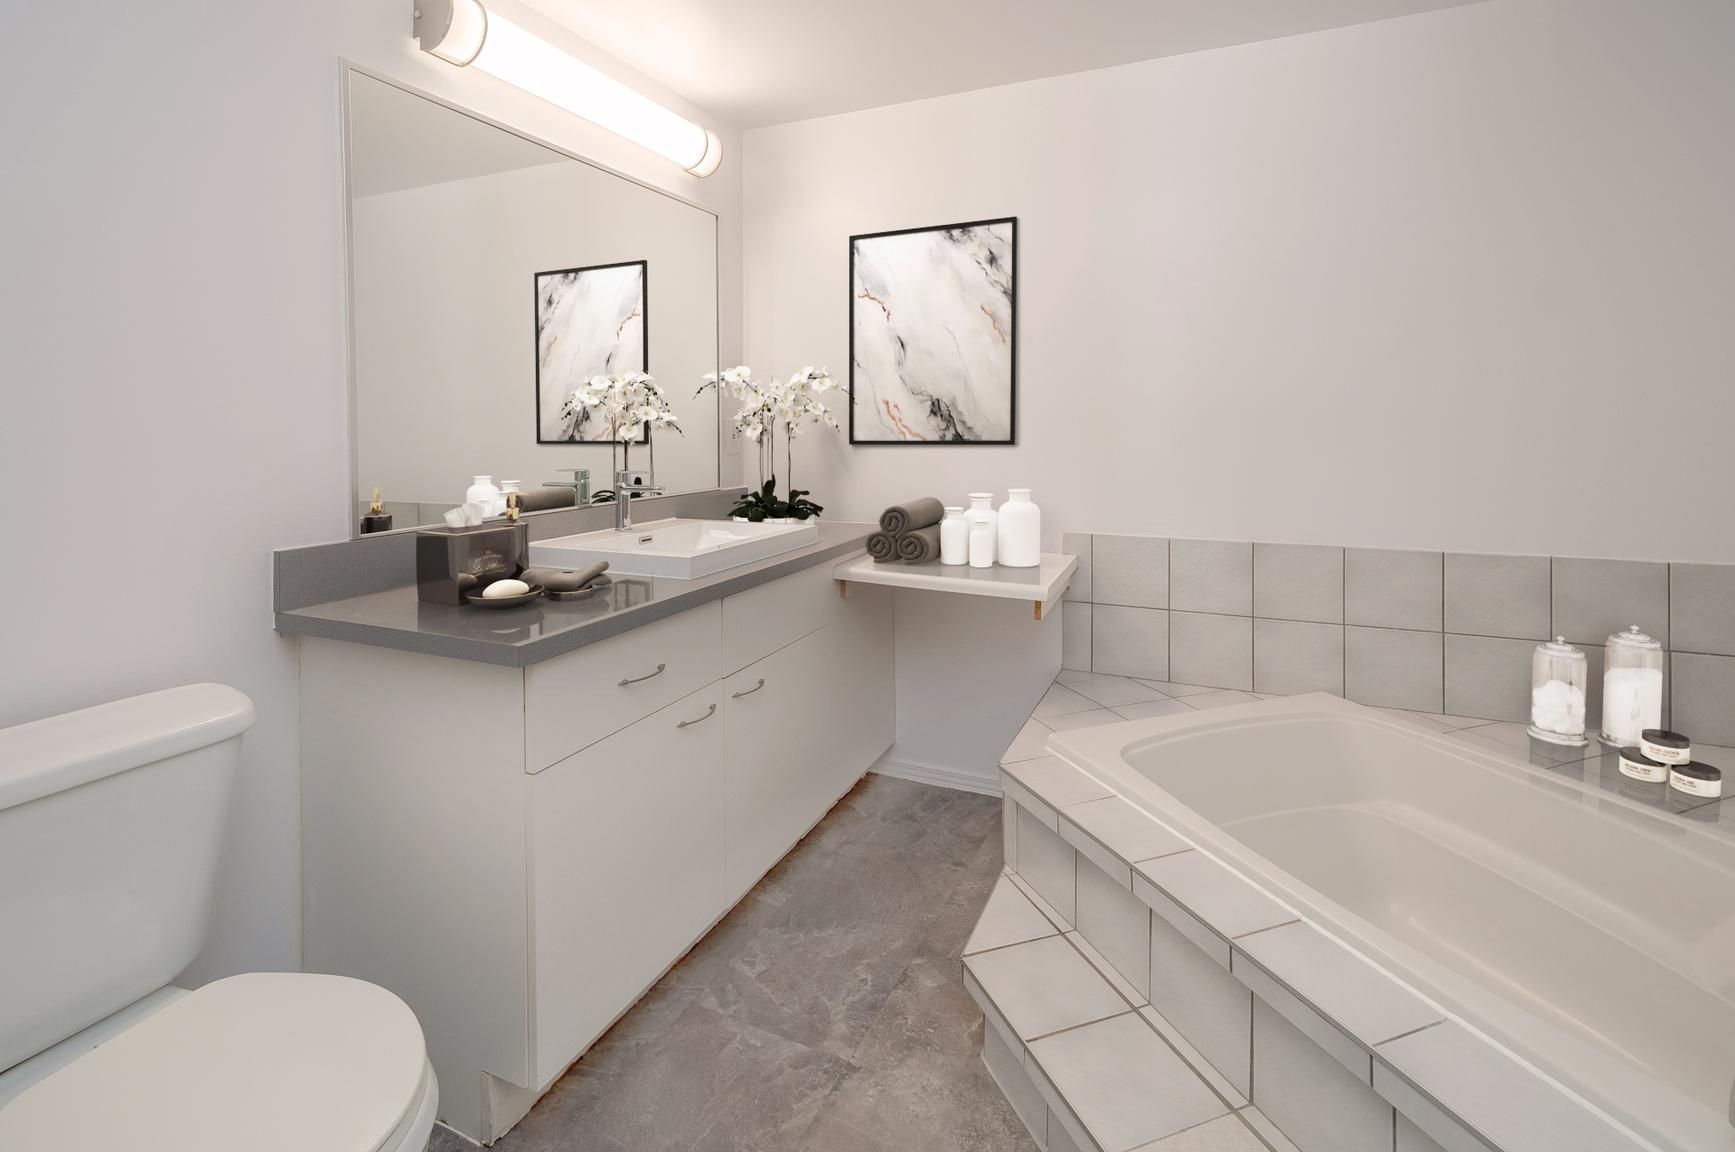 1 bedroom Apartments for rent in Quebec City at Les Appartements du Verdier - Photo 22 - RentQuebecApartments – L407122